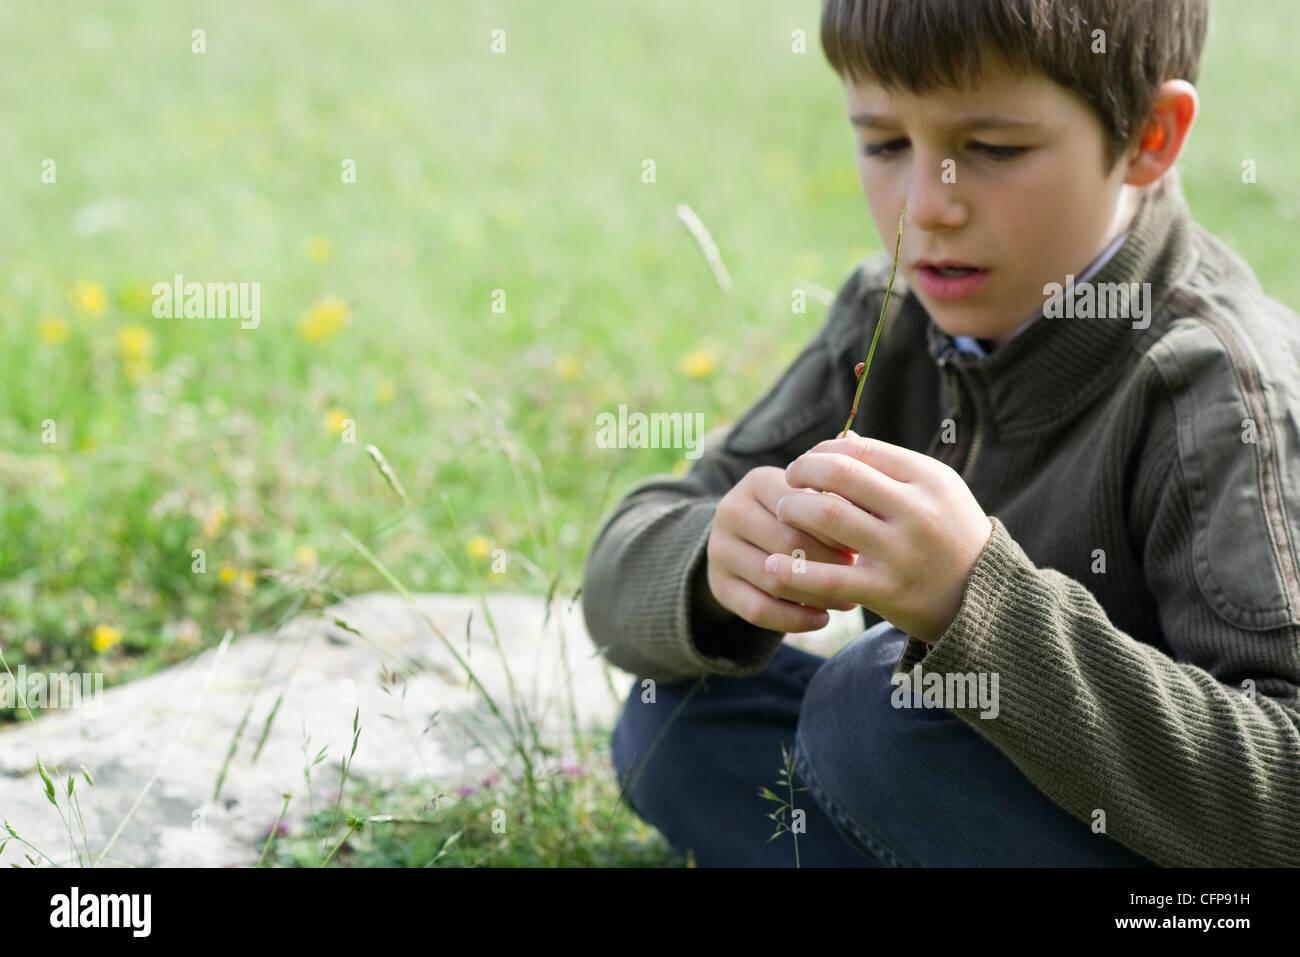 Boy in meadow - Stock Image